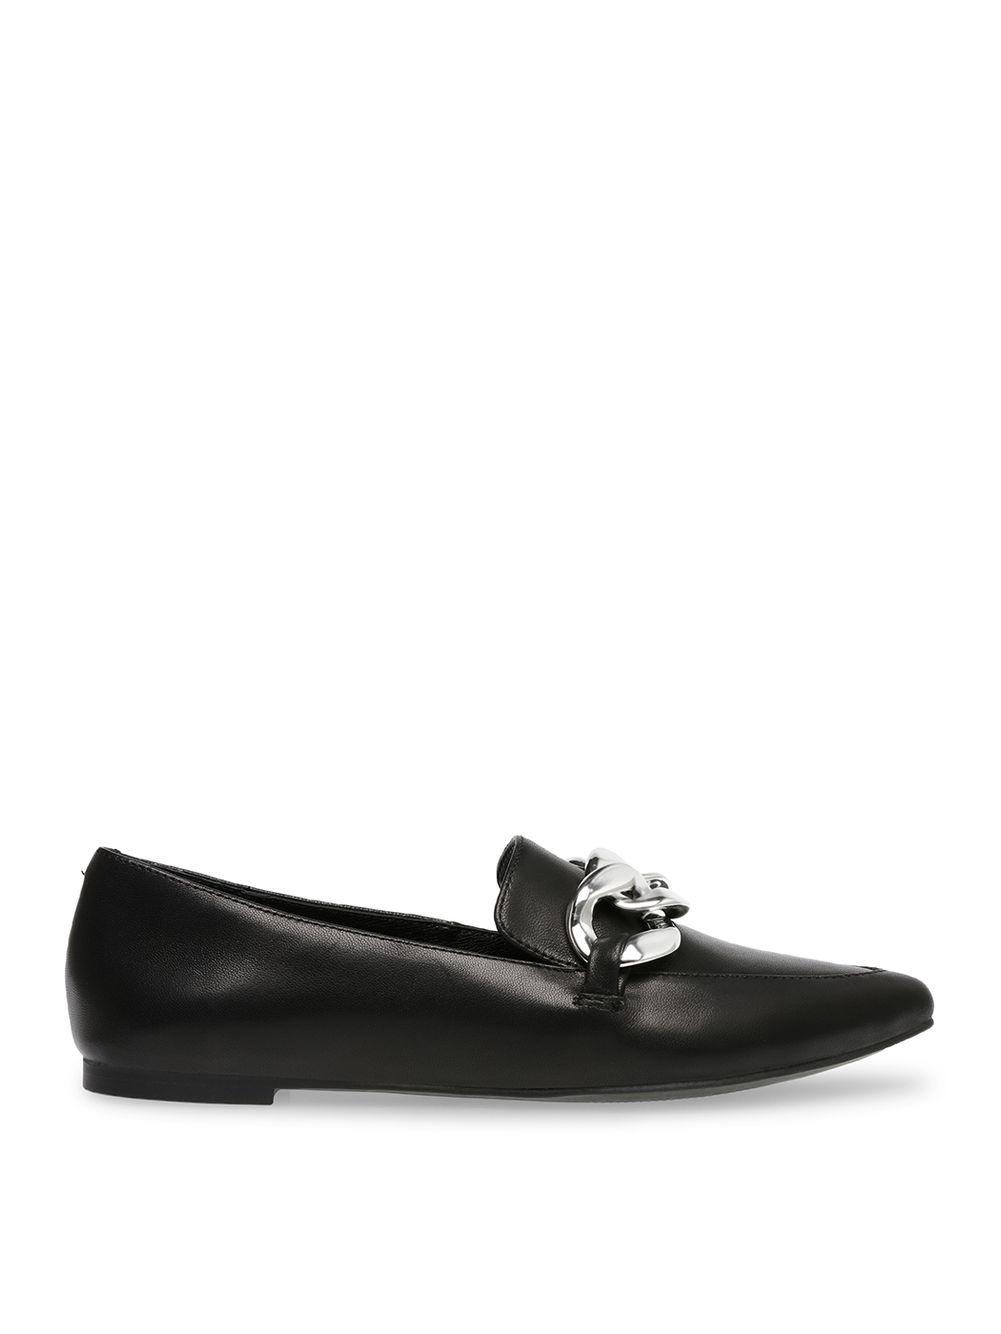 Steve madden flat shoes black